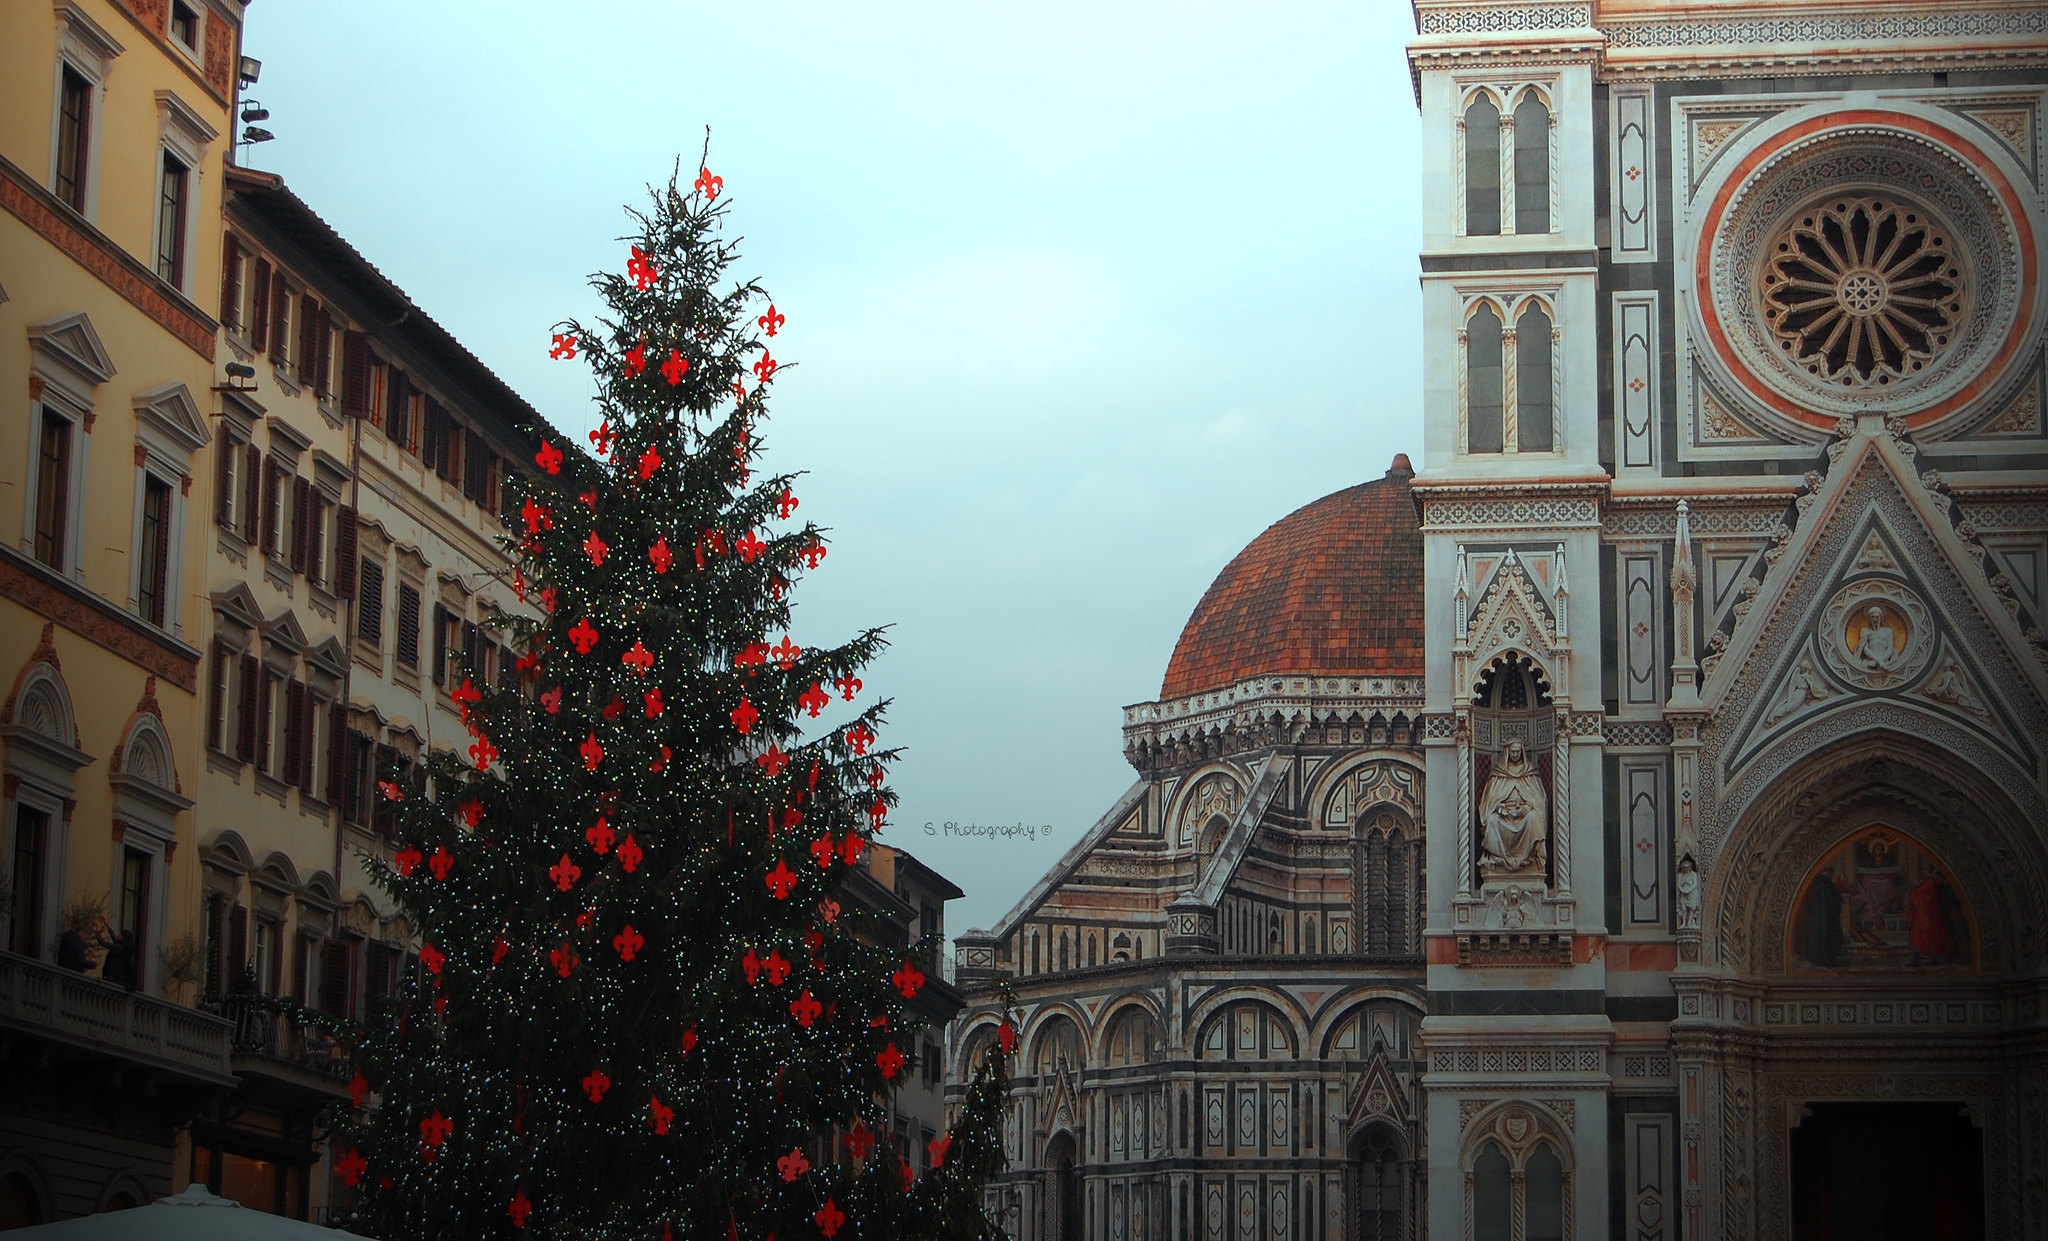 Concerto di Natale a Firenze 2019